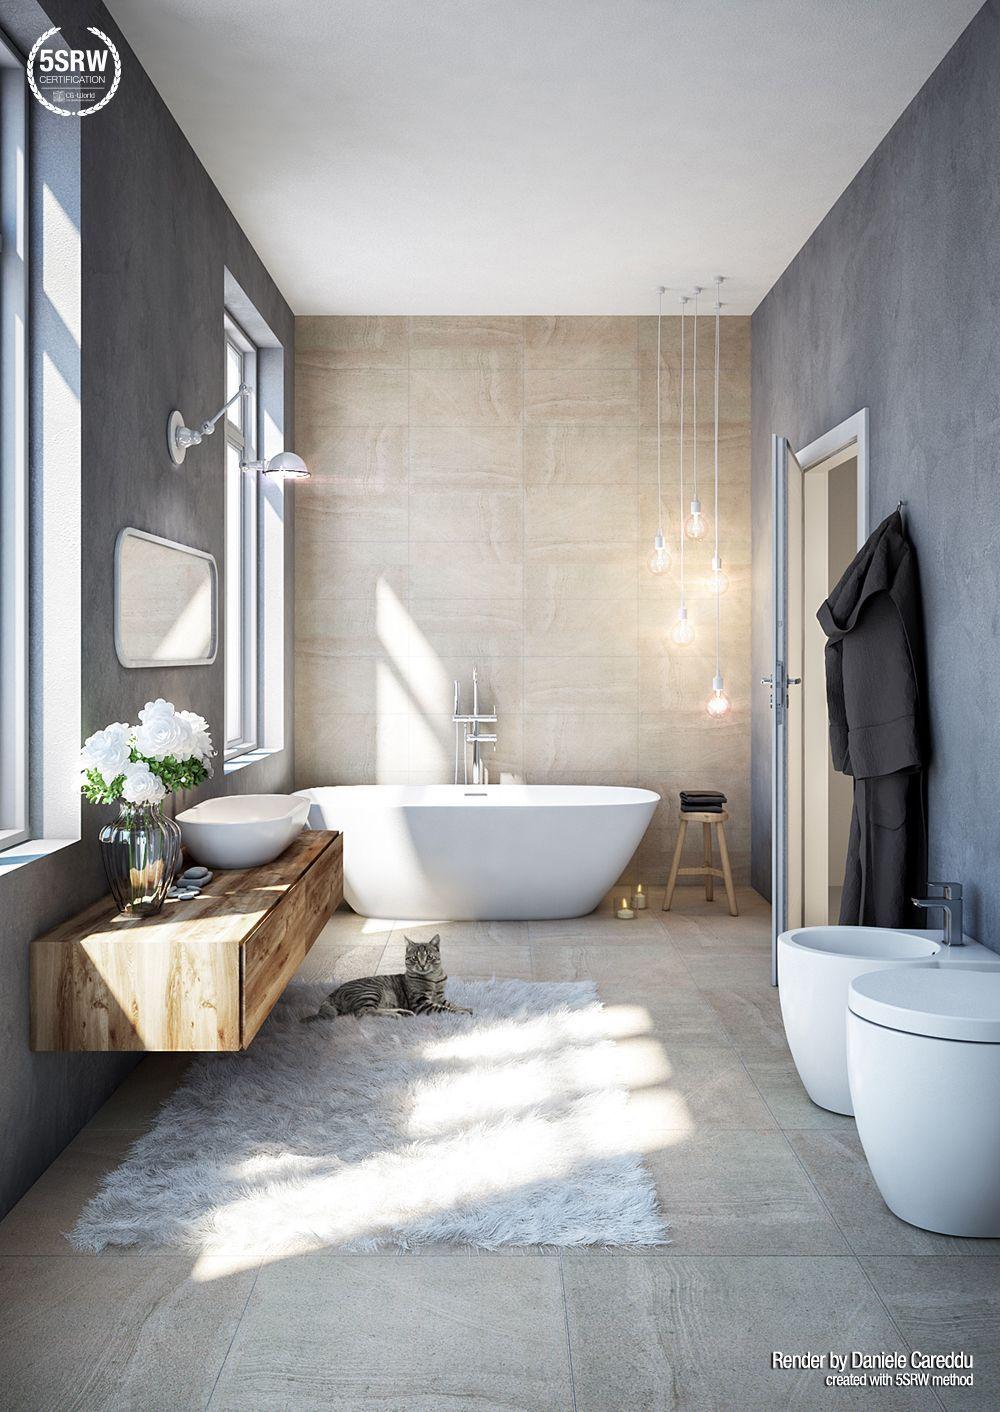 Small Bathroom Ideas Bathroom Design Inspiration Modern Bathroom Design Bathroom Interior Design